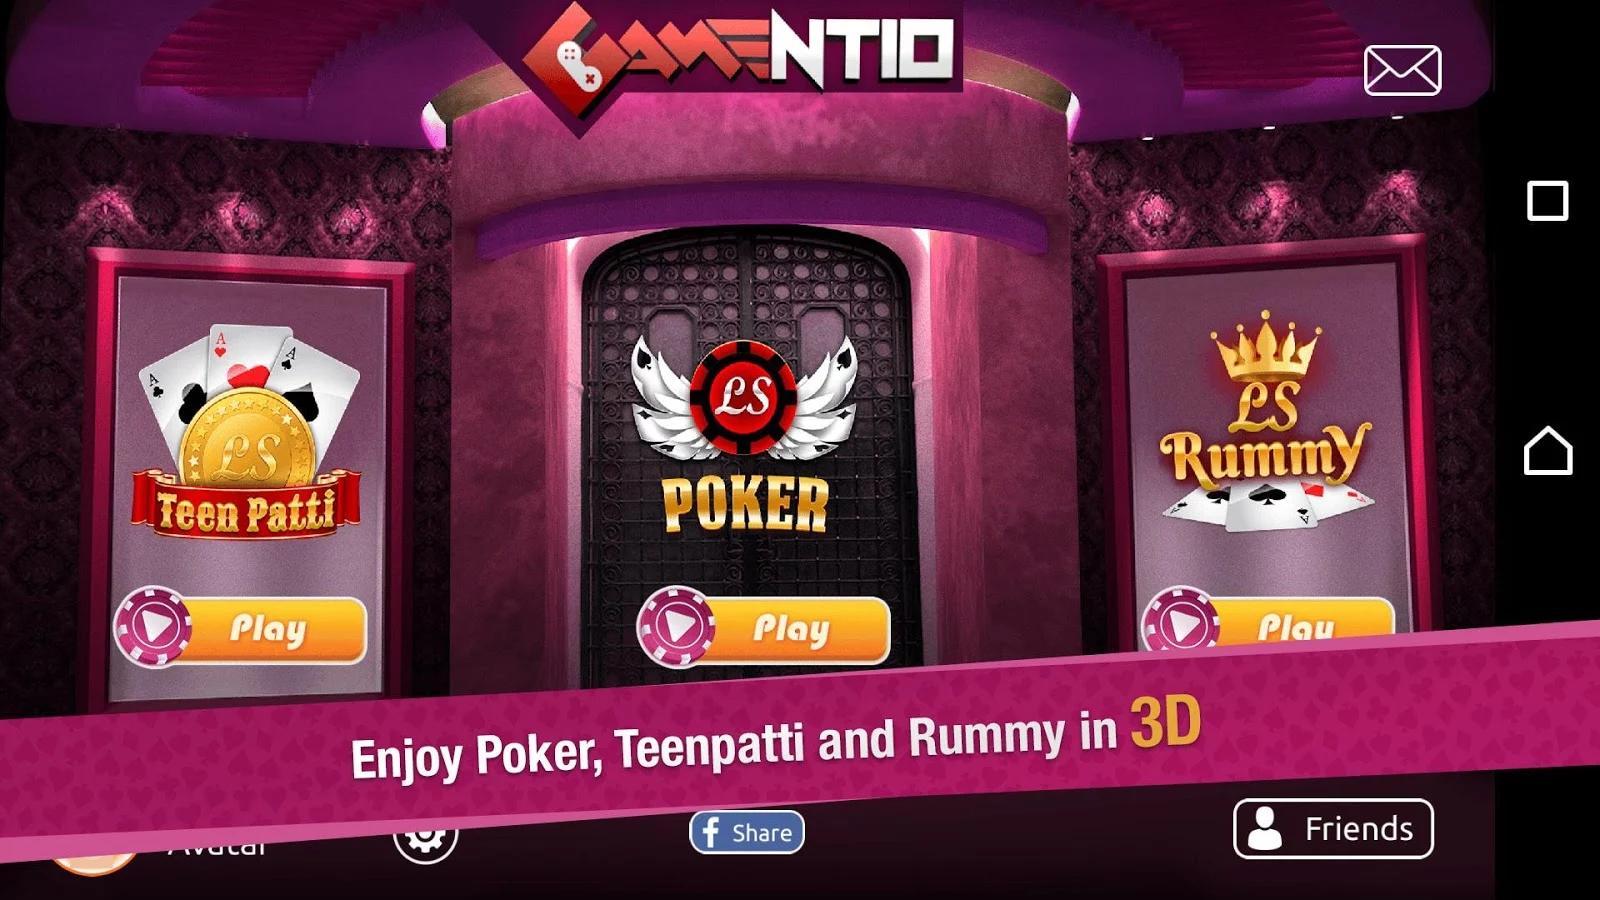 Gamentio 3D Casino Card Games